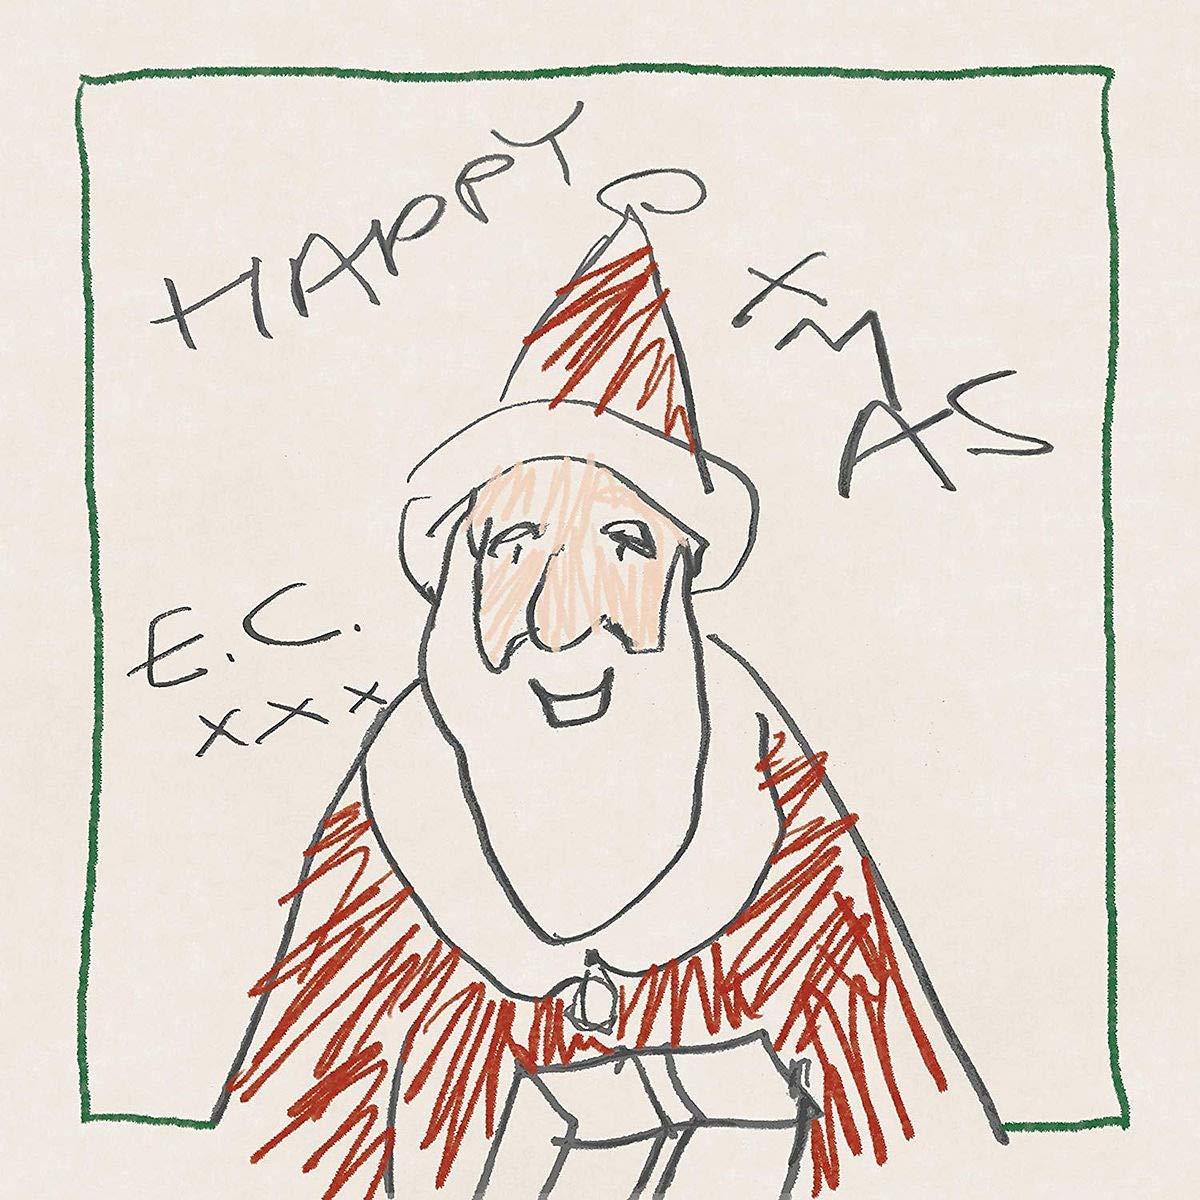 Эрик Клэптон Eric Clapton. Happy Xmas (2 LP) эрик клэптон eric clapton slowhand 35th anniversary edition lp